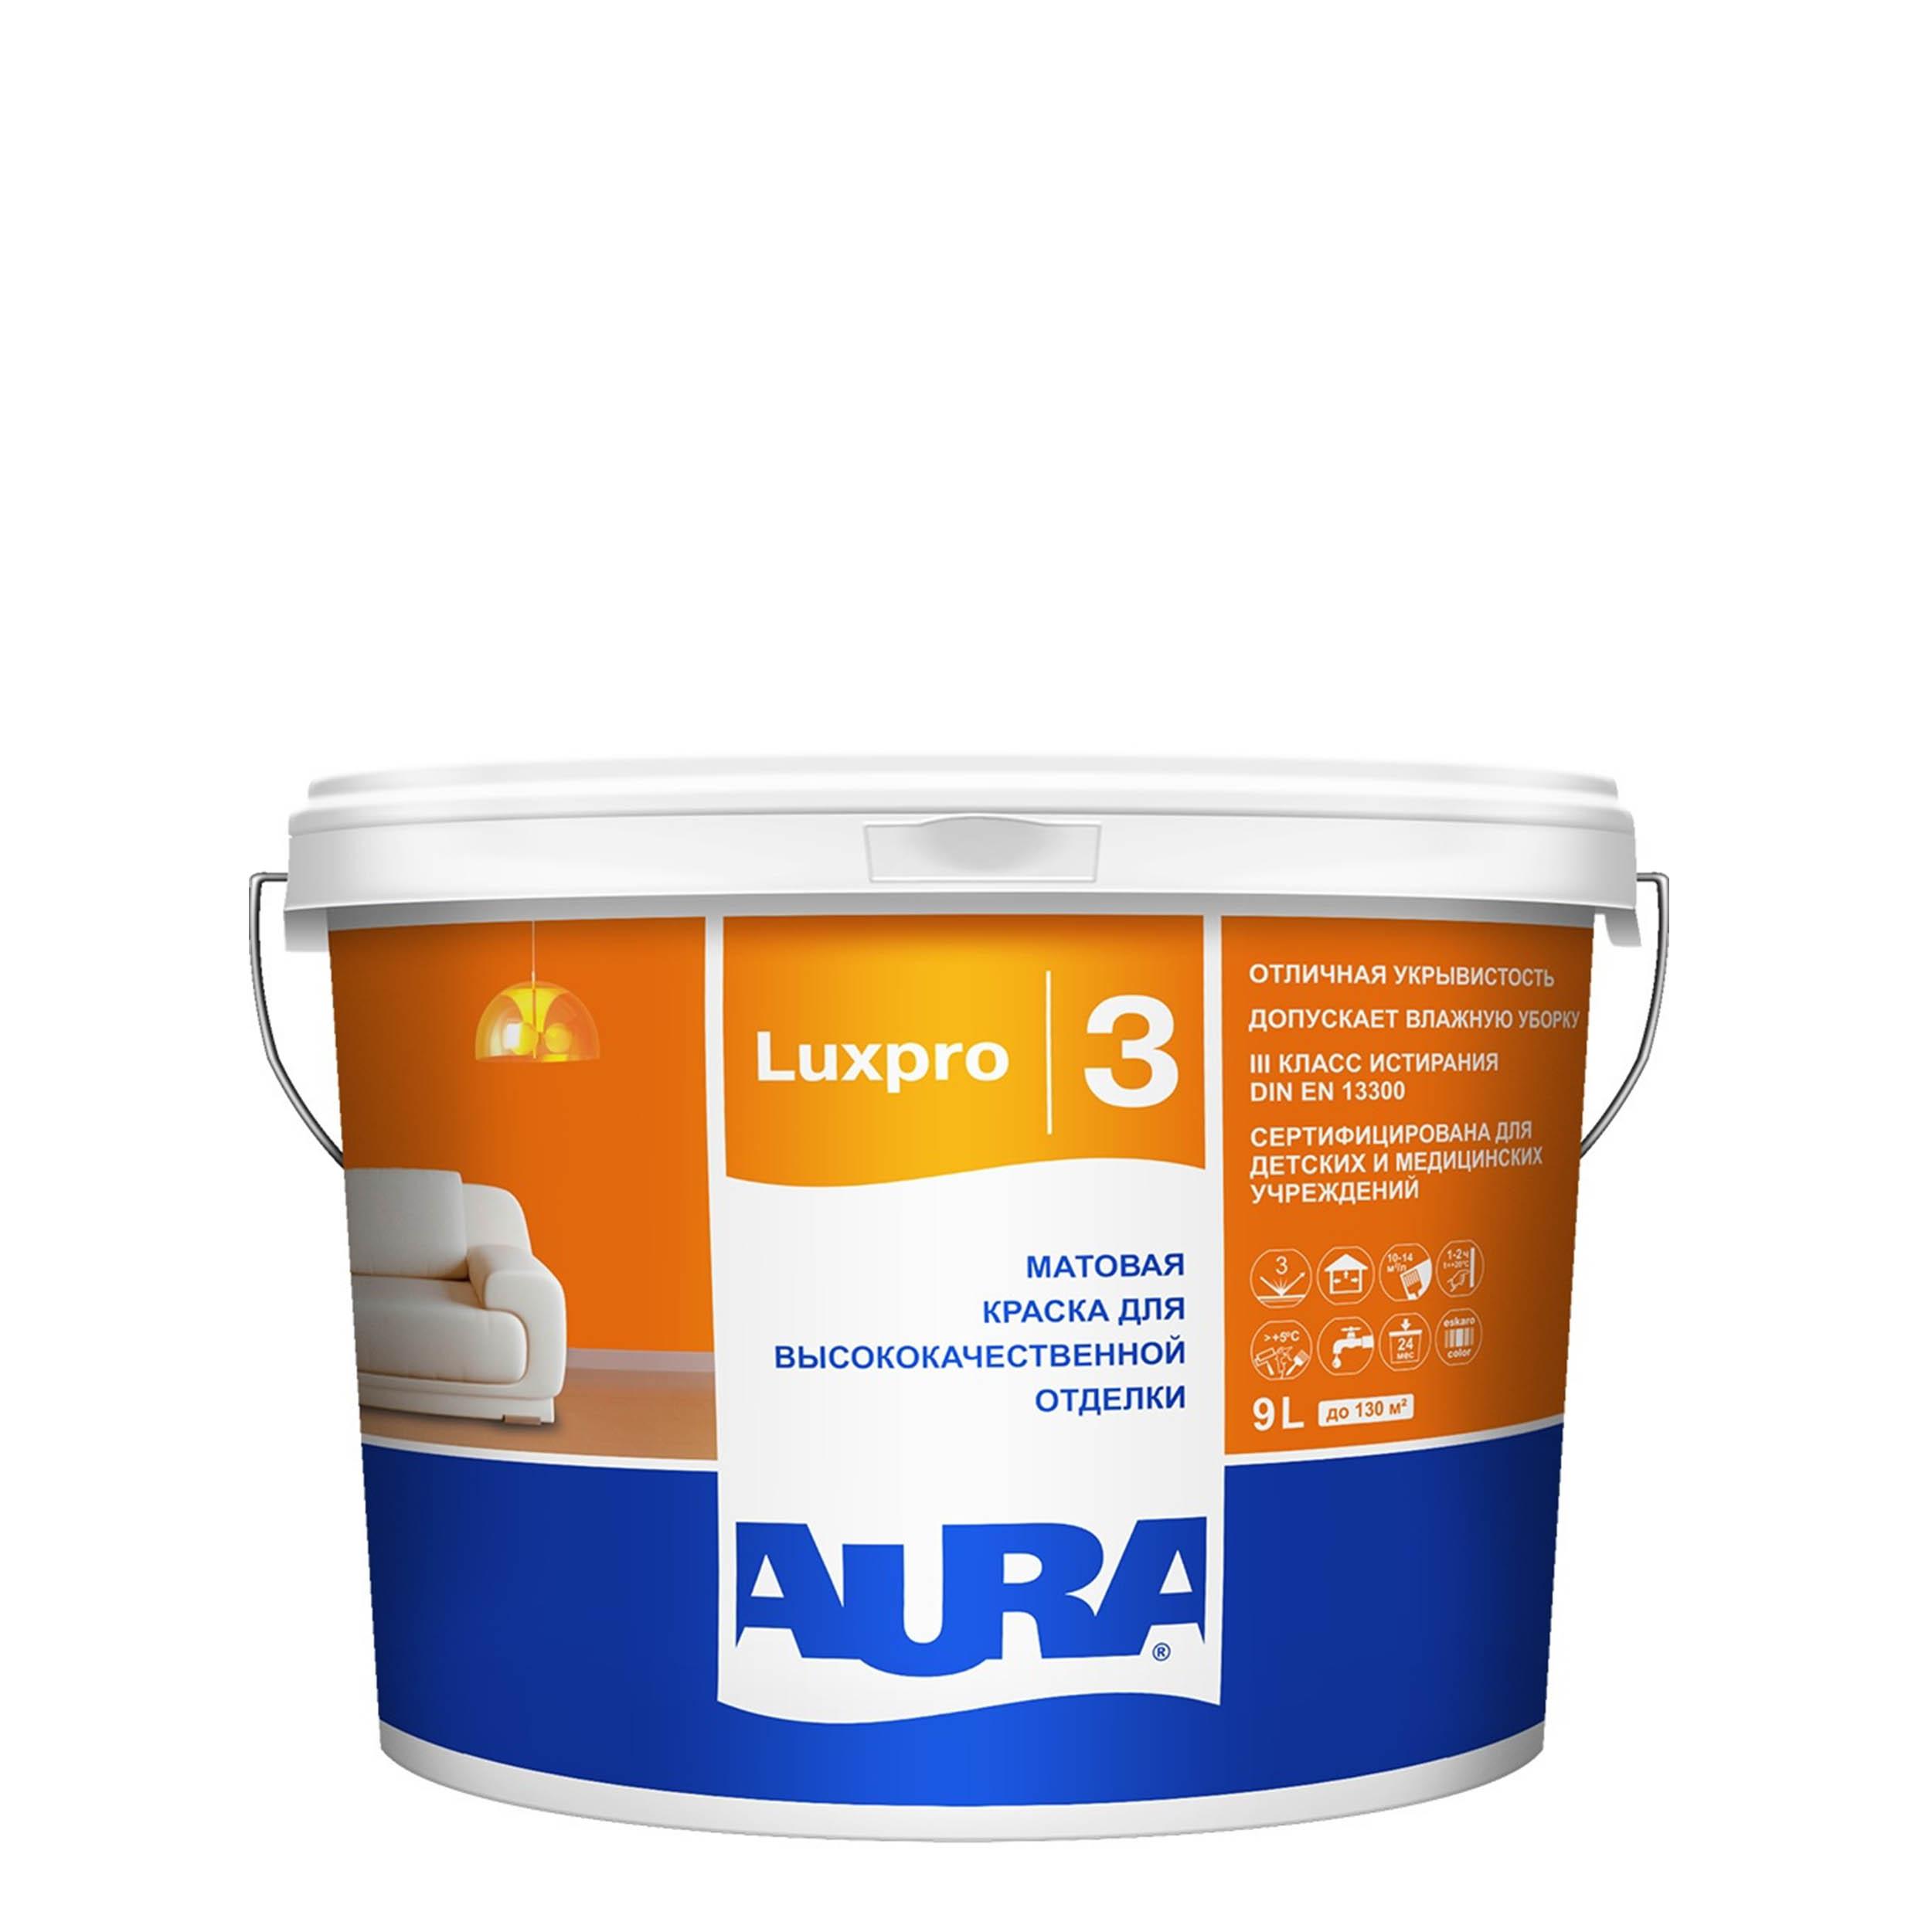 Фото 3 - Краска интерьерная, Aura LuxPRO 3, RAL 4001, 11 кг.